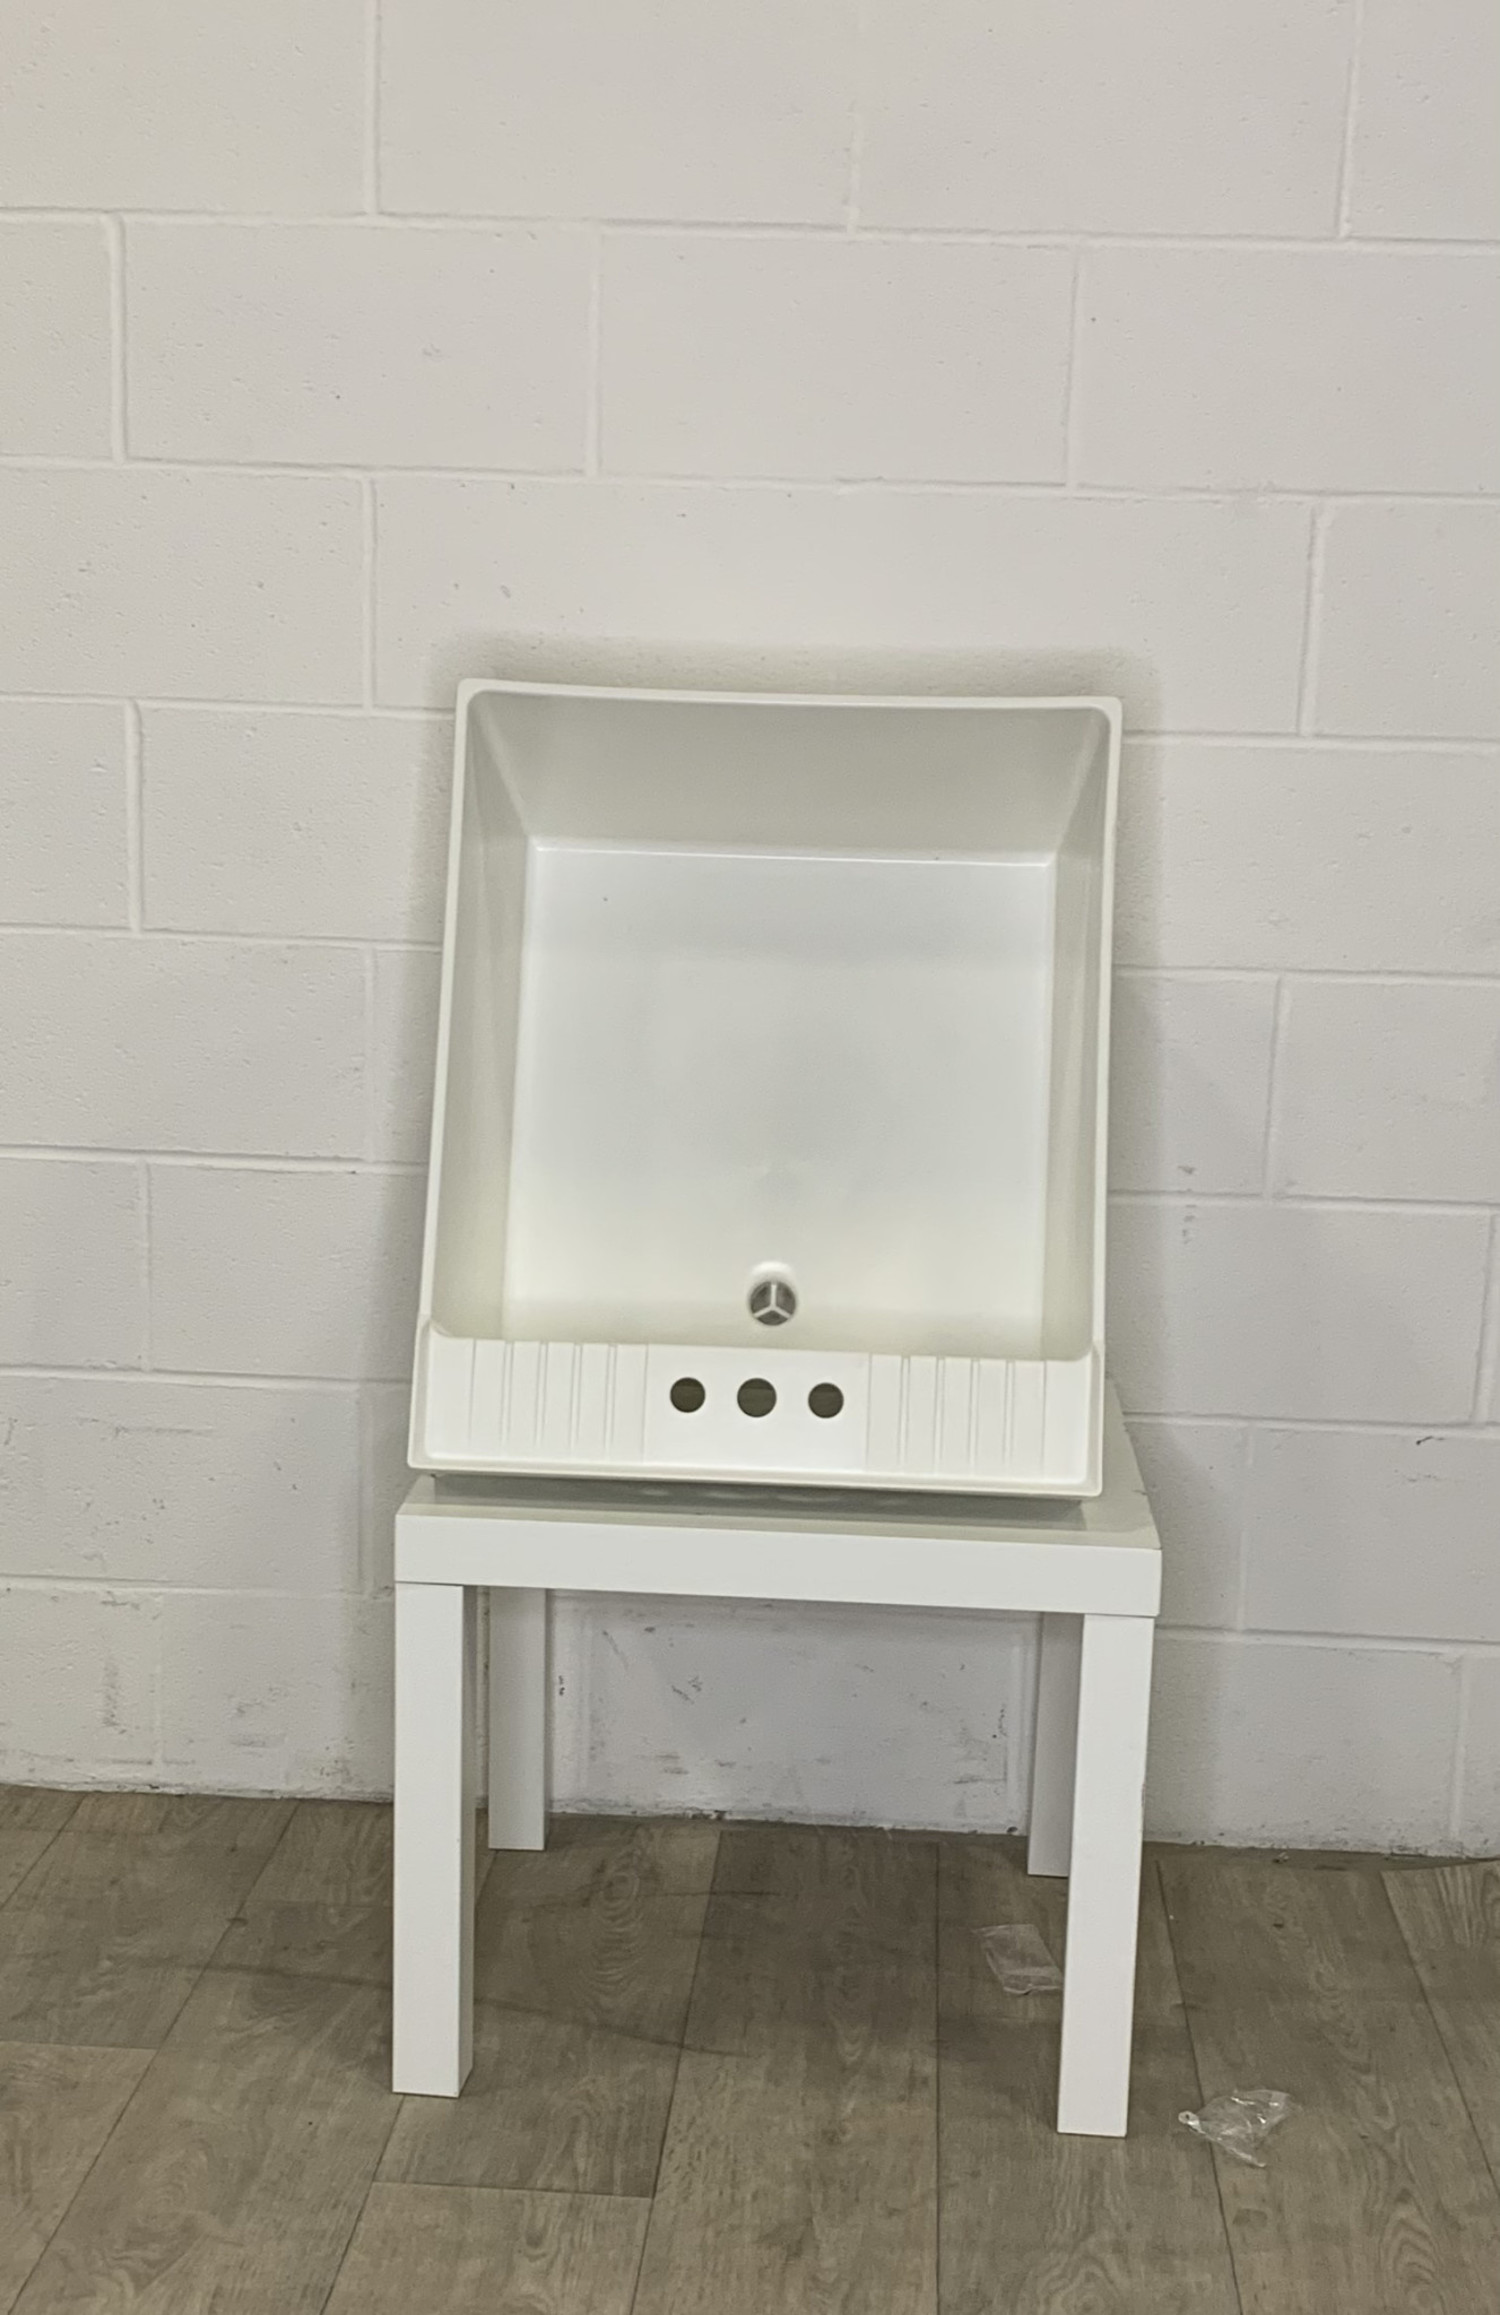 east york plastic laundry tub